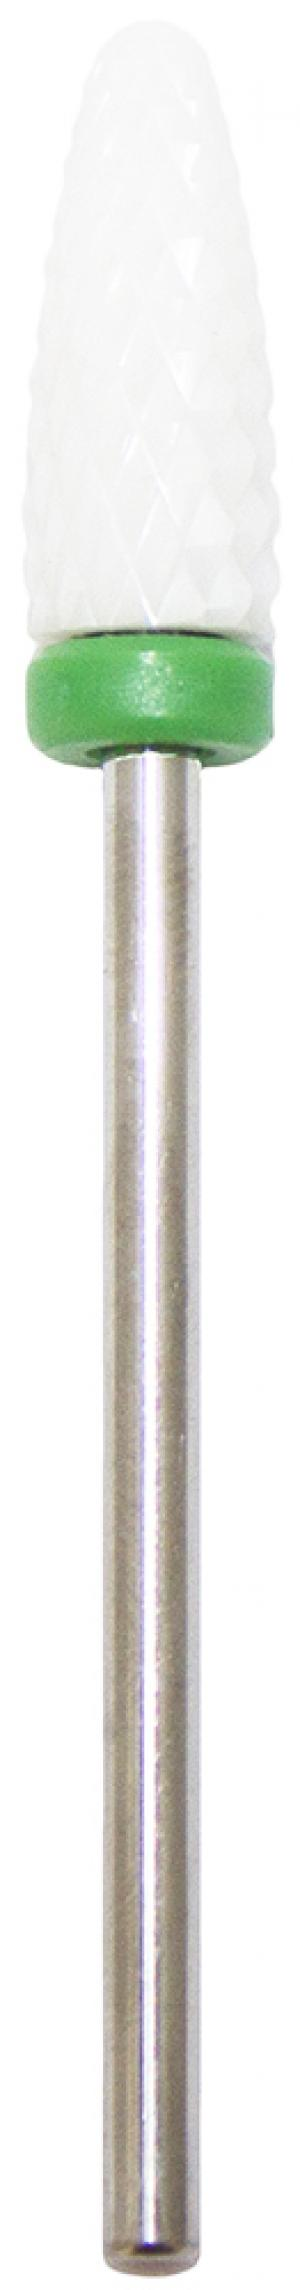 Насадка для фрезера ANVI Professional Flame Ceramic C 3/32  - 00-00010793